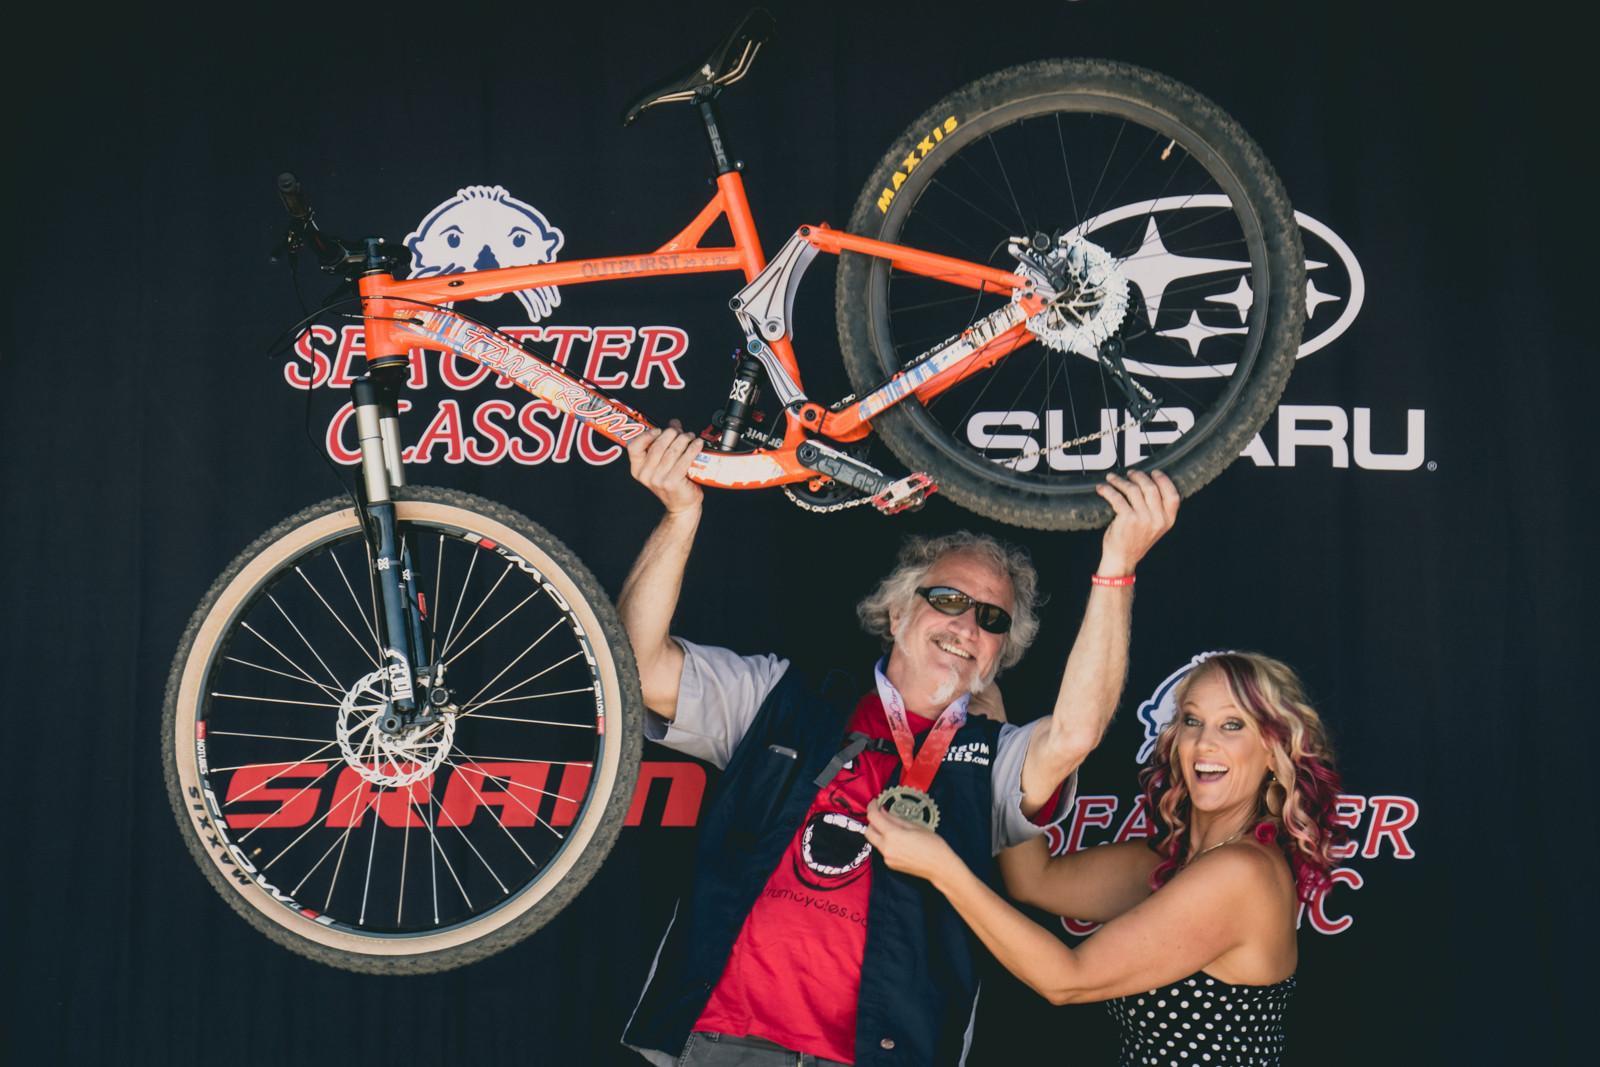 Tantrum Downburst Mixed Wheel 29/27.5 Bike - 2016 Sea Otter Classic Pit Bits - Mountain Biking Pictures - Vital MTB